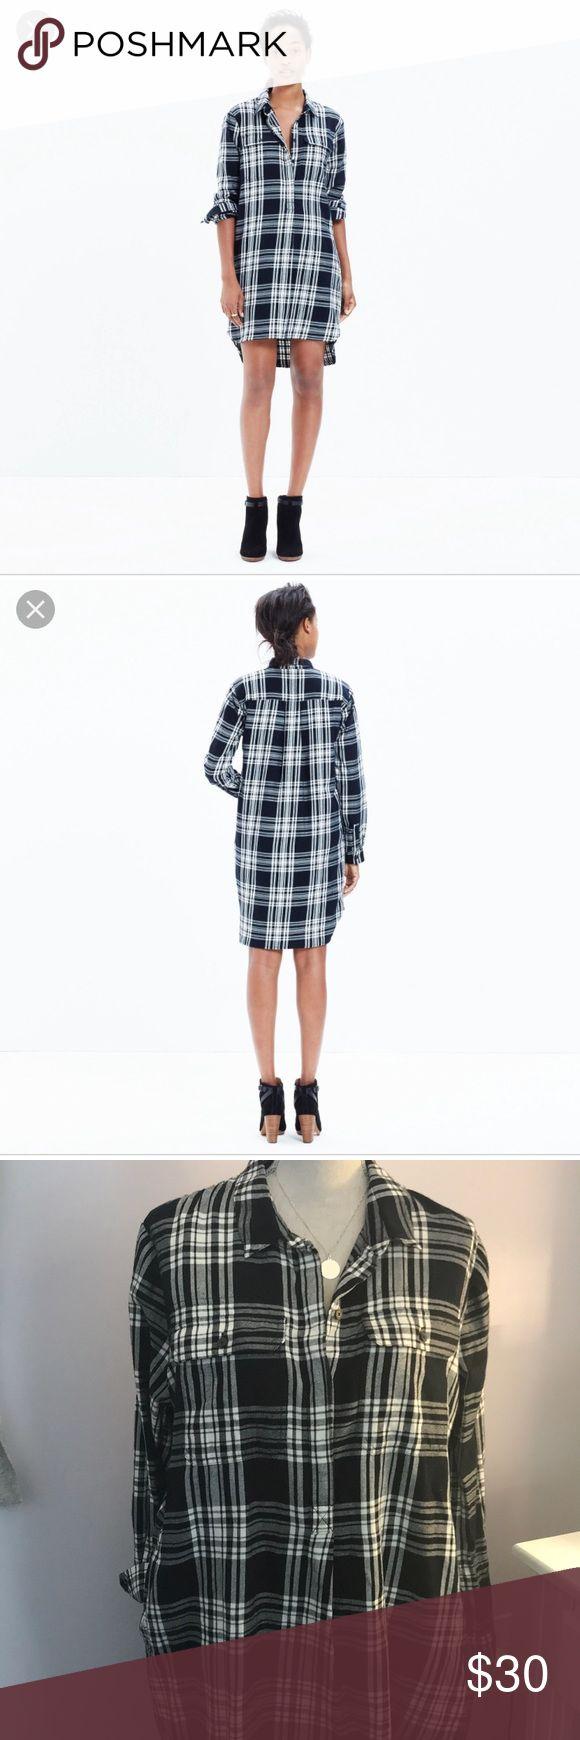 Madewell Daywalk Black flannel shirt dress sz L Long shirt dress sz L has two side pockets. Madewell Dresses